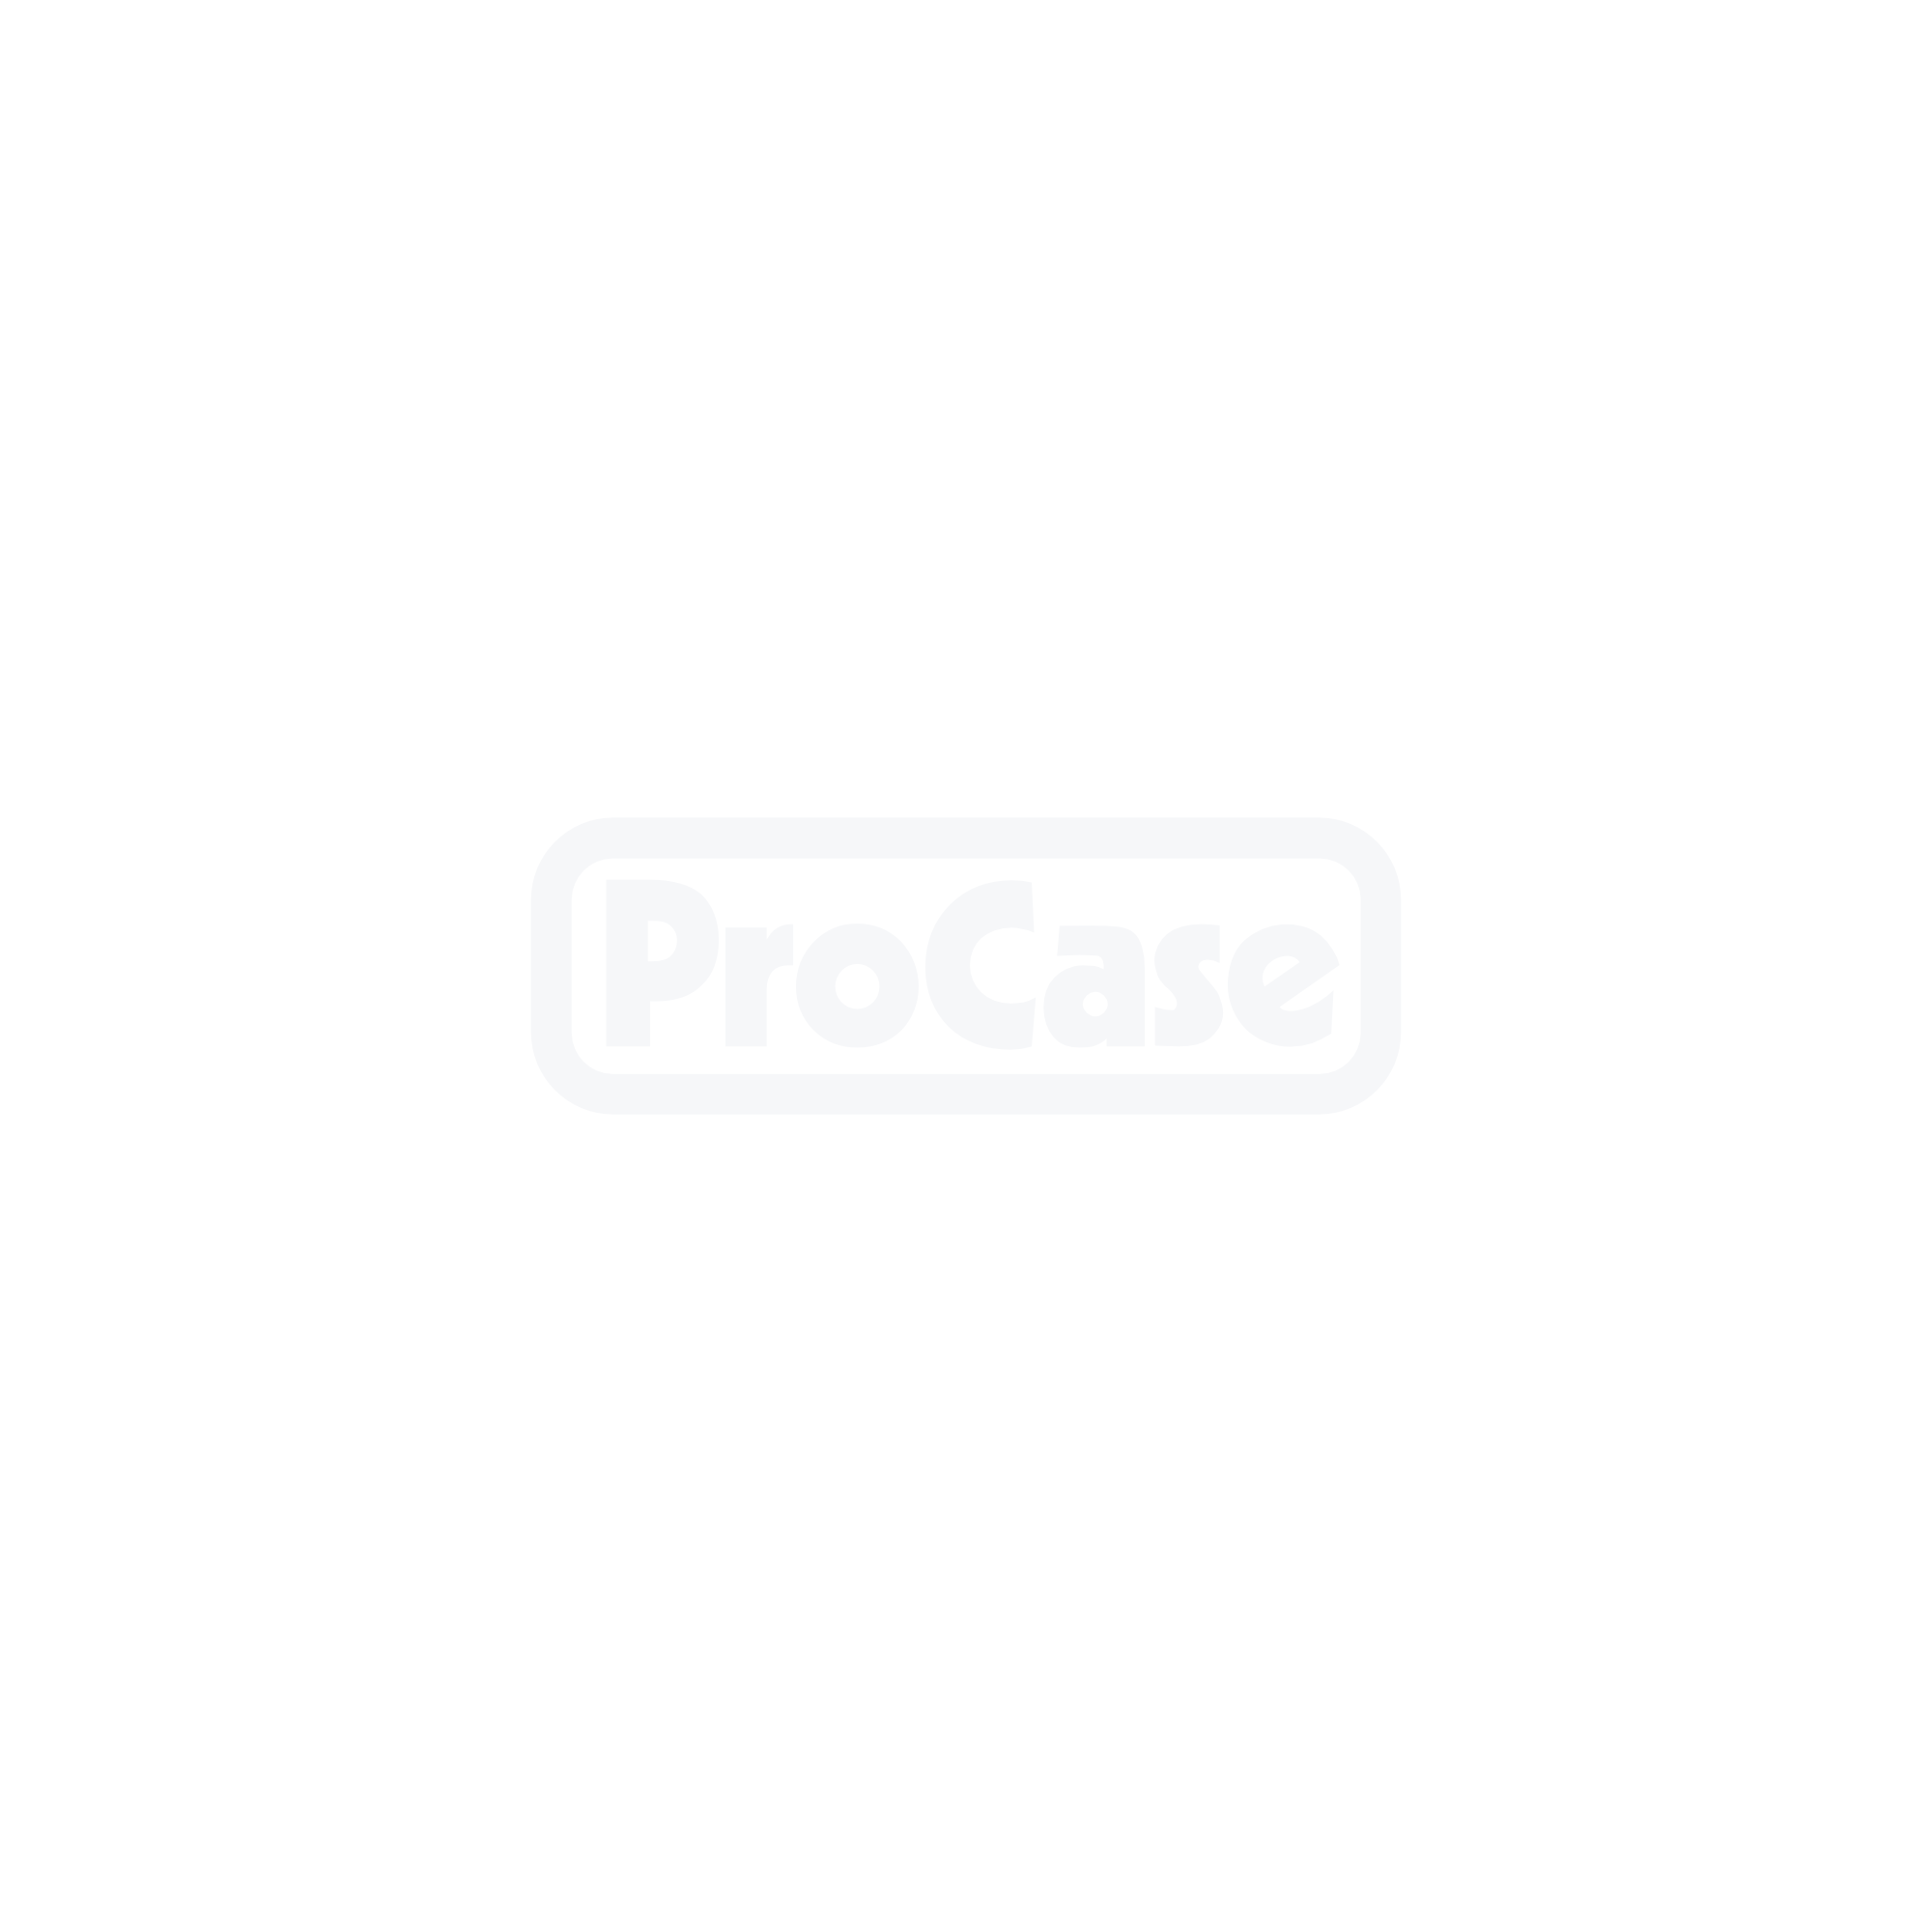 Versandschild 320 x 230 mm